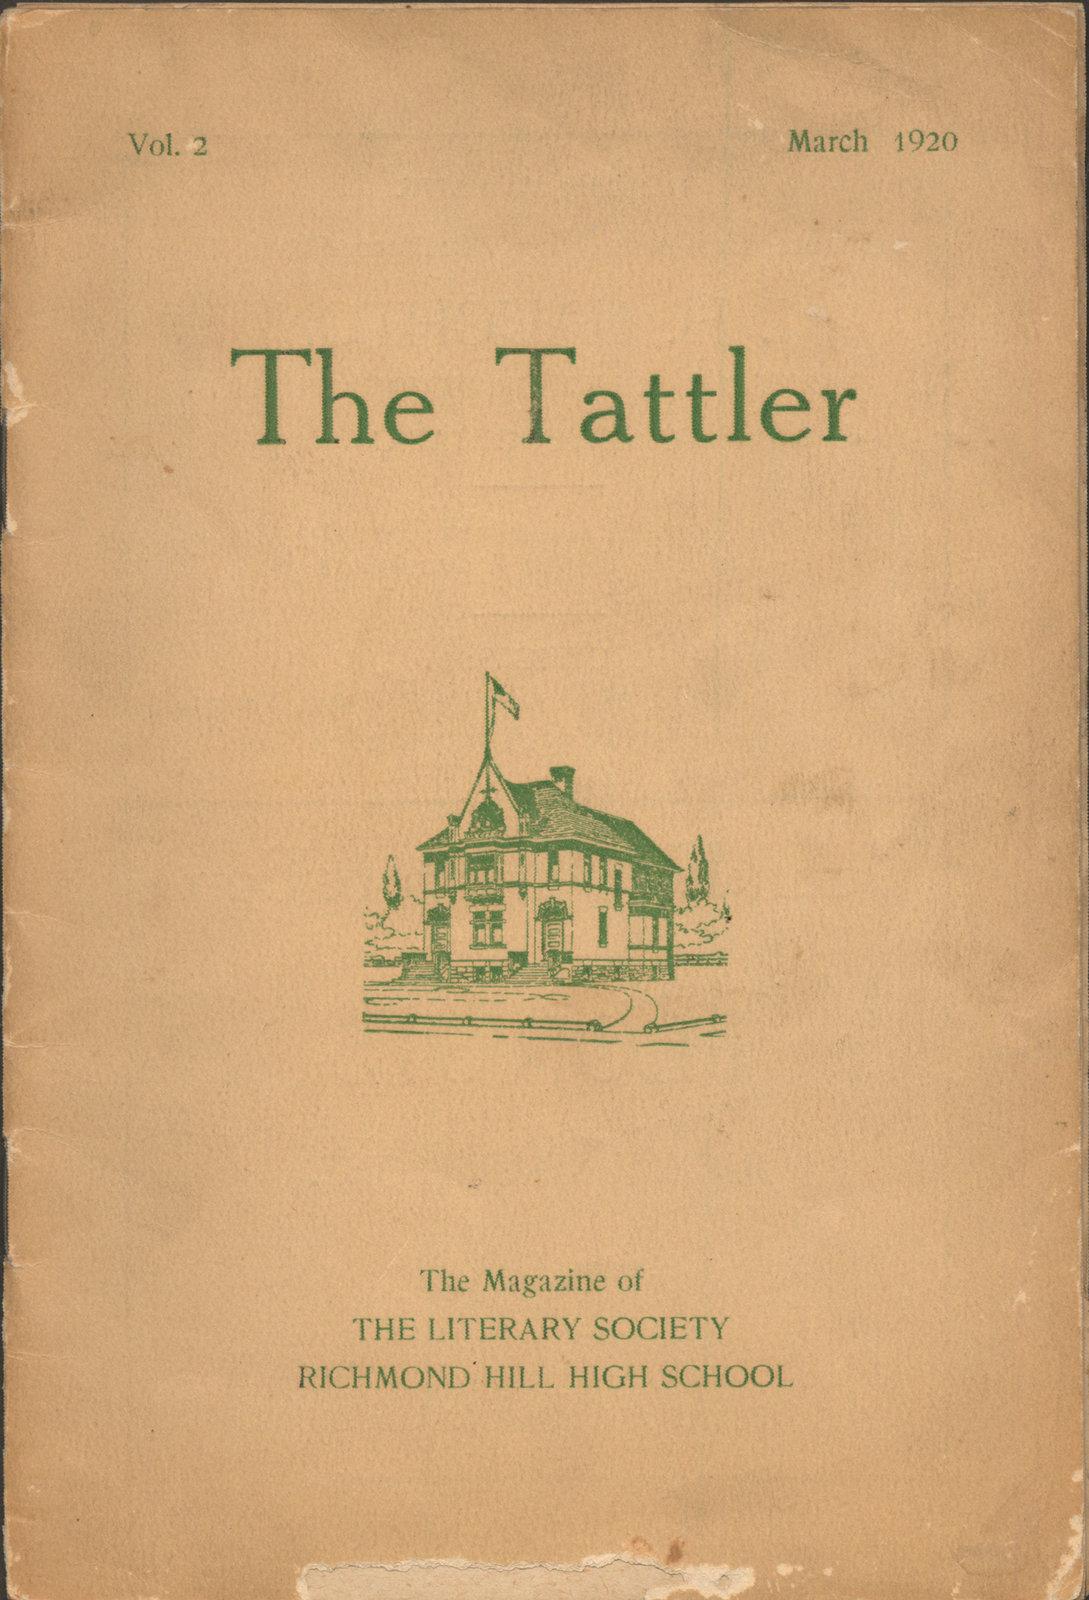 The Tattler magazine